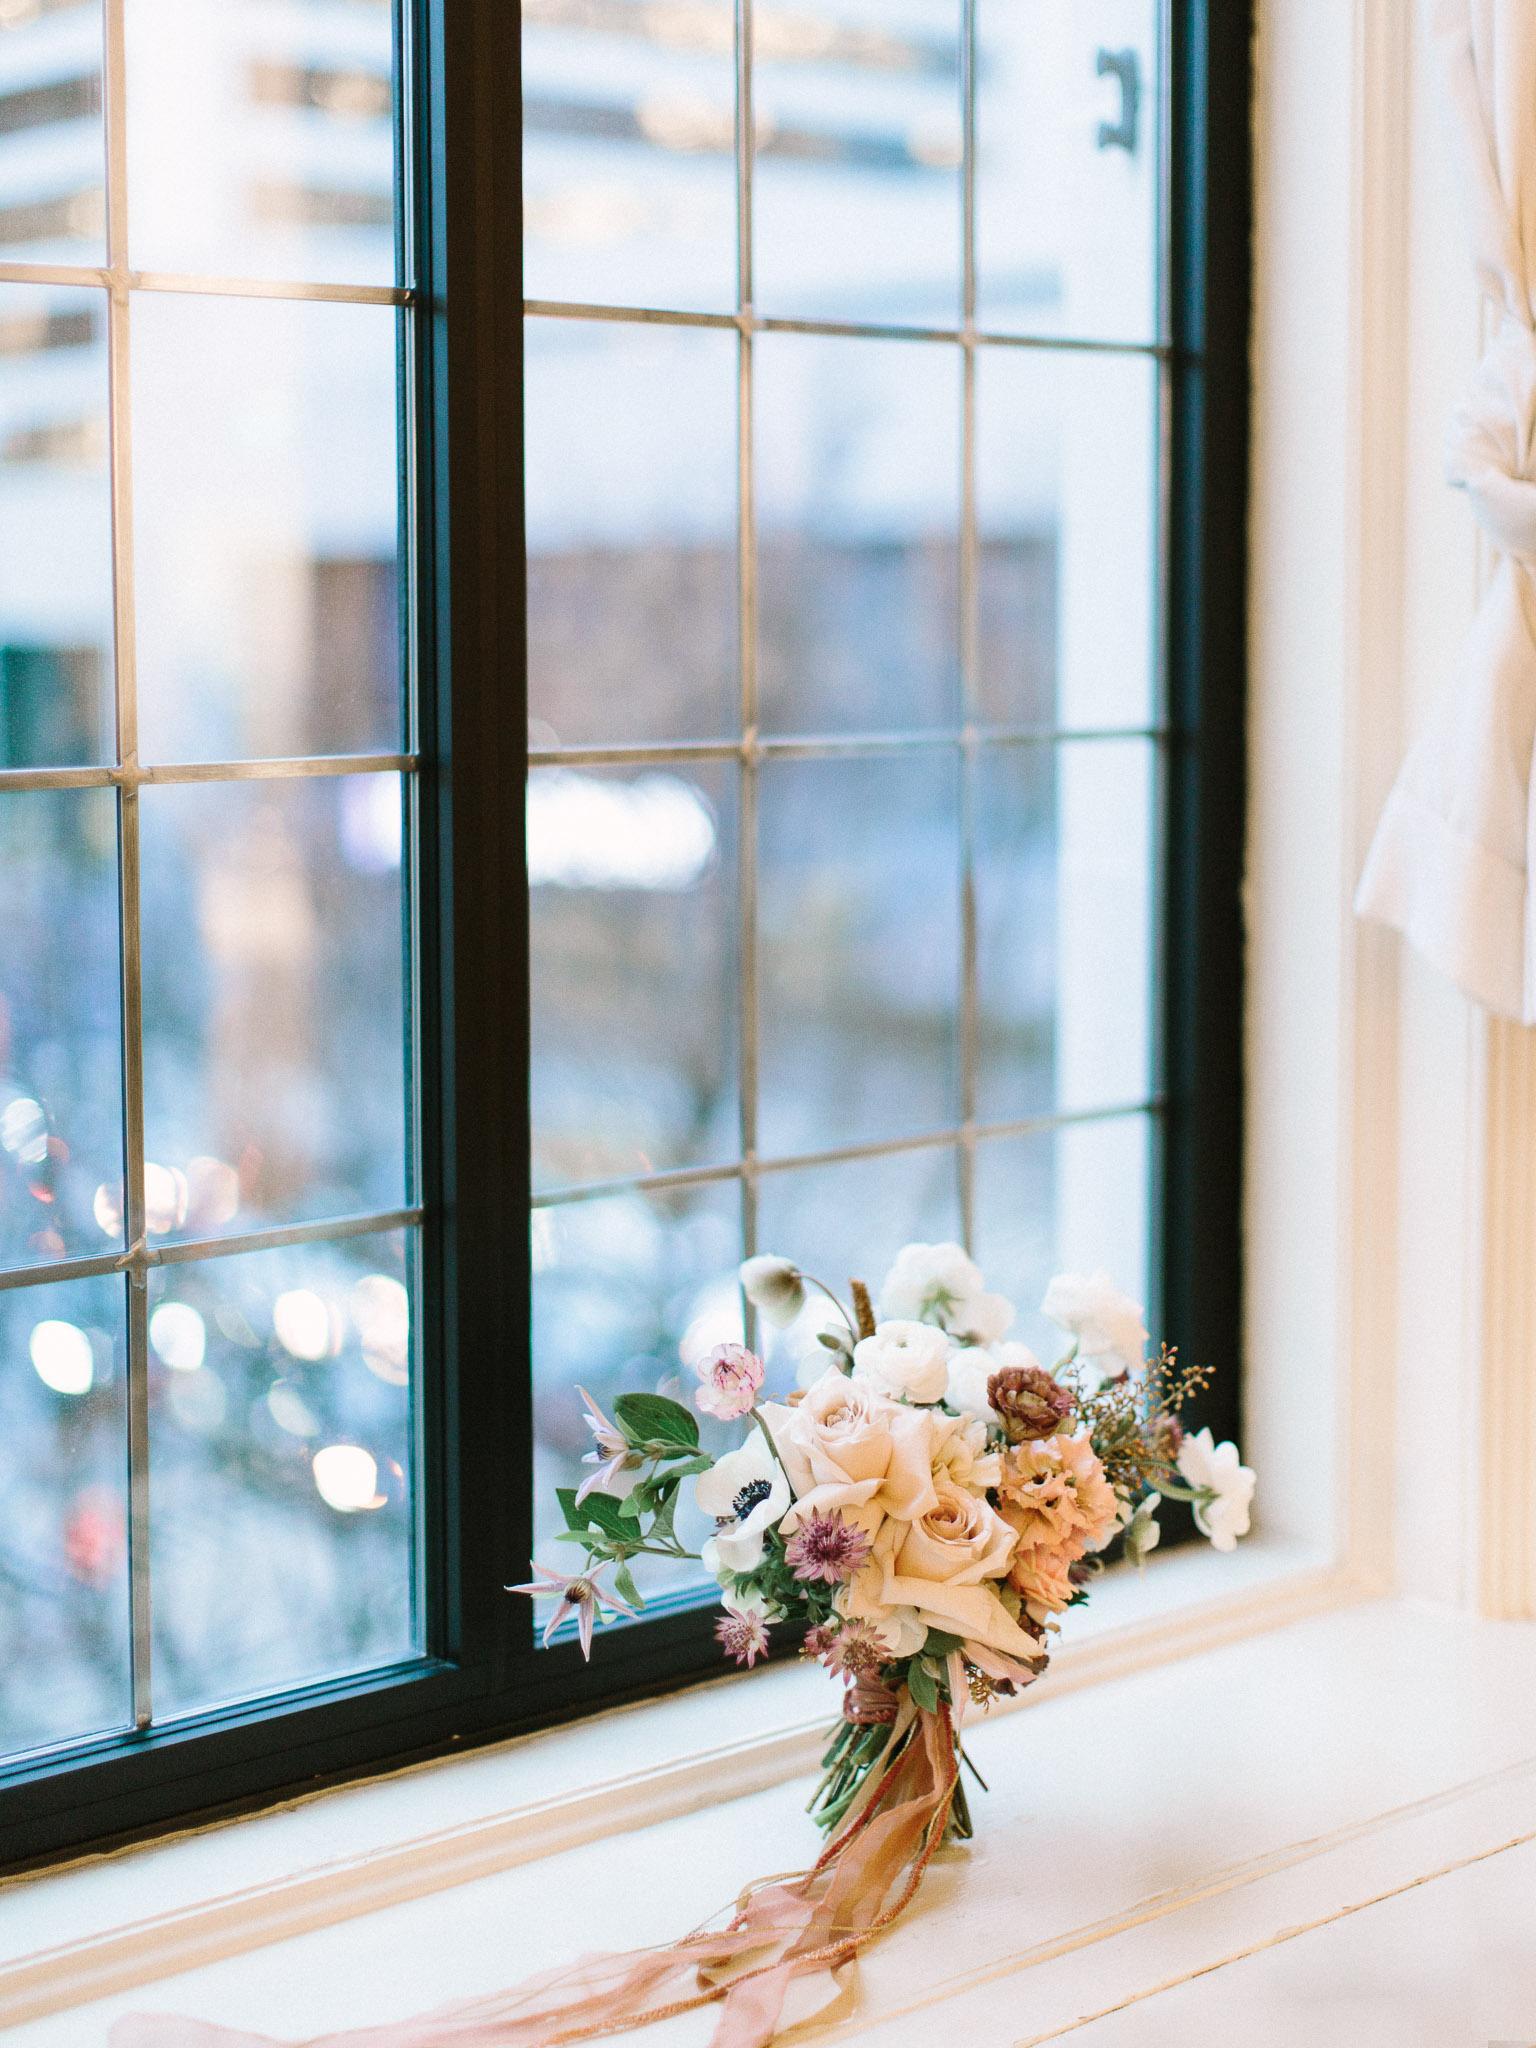 Hanna&Jordan Wedding_HotelVancouver_9186.jpg